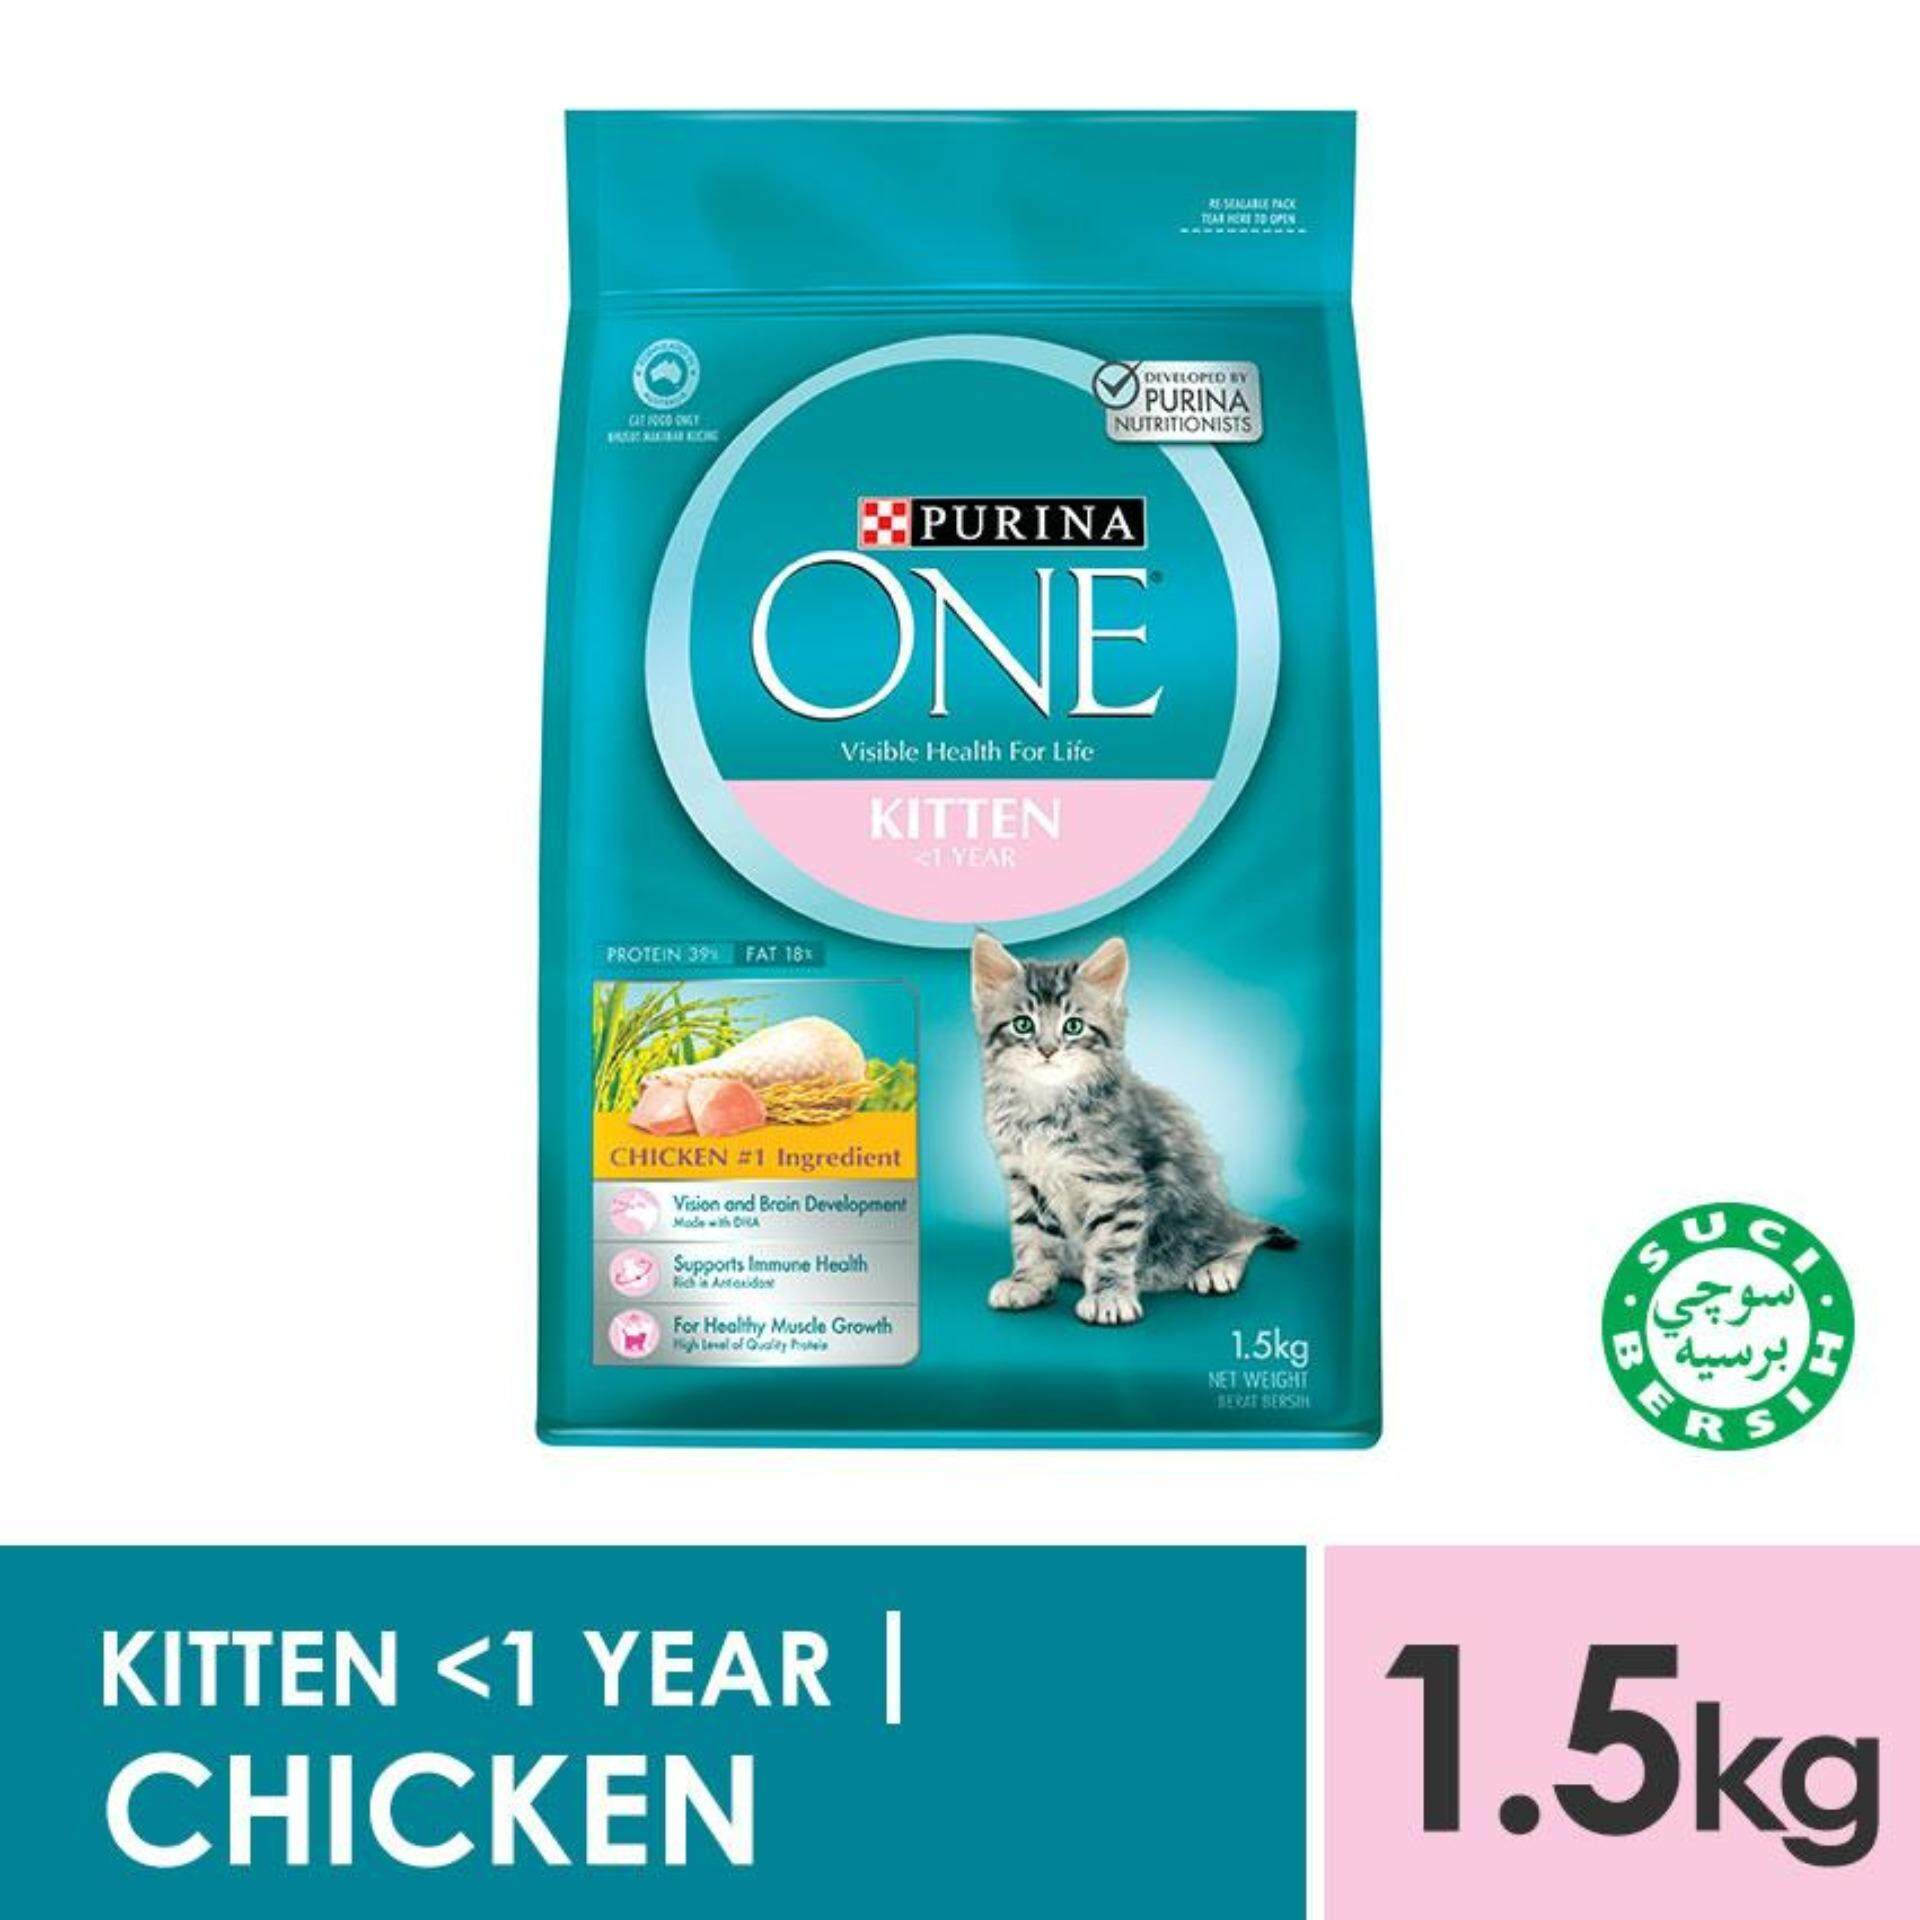 PURINA ONE® Kitten Food with Chicken  (1 x 1.5kg) - Pet Food/ Dry Food/ Cat Food/ Makanan Kucing